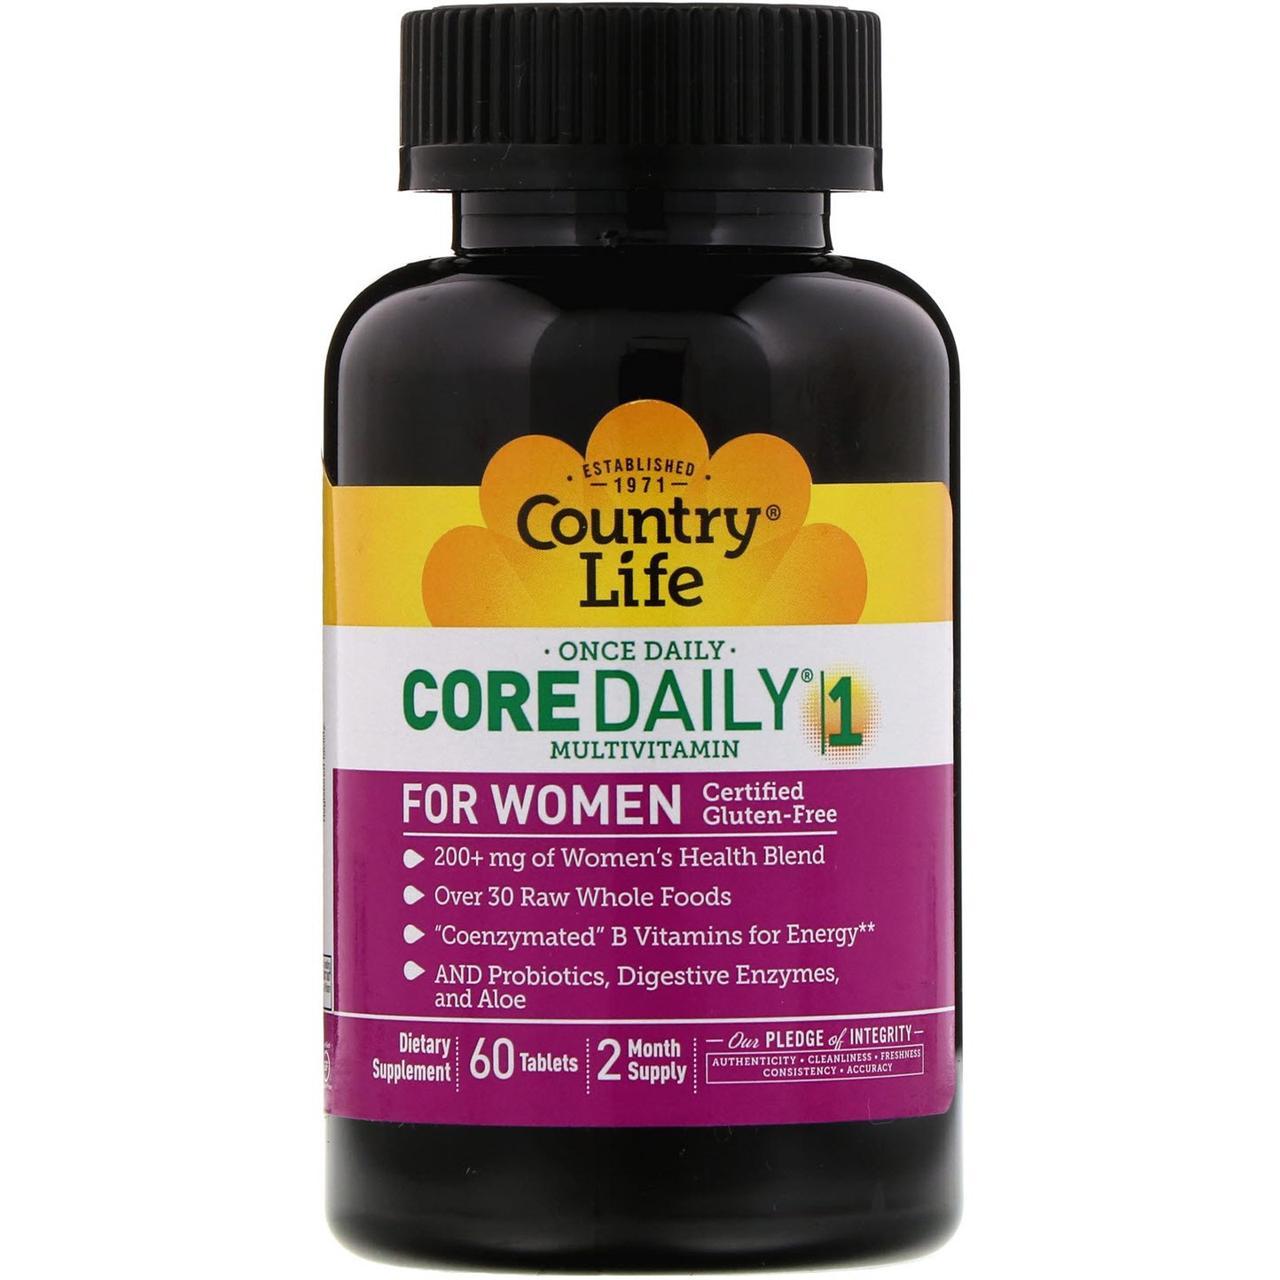 Country Life, Мультивитамины Core Daily-1, для женщин, 60 таблеток